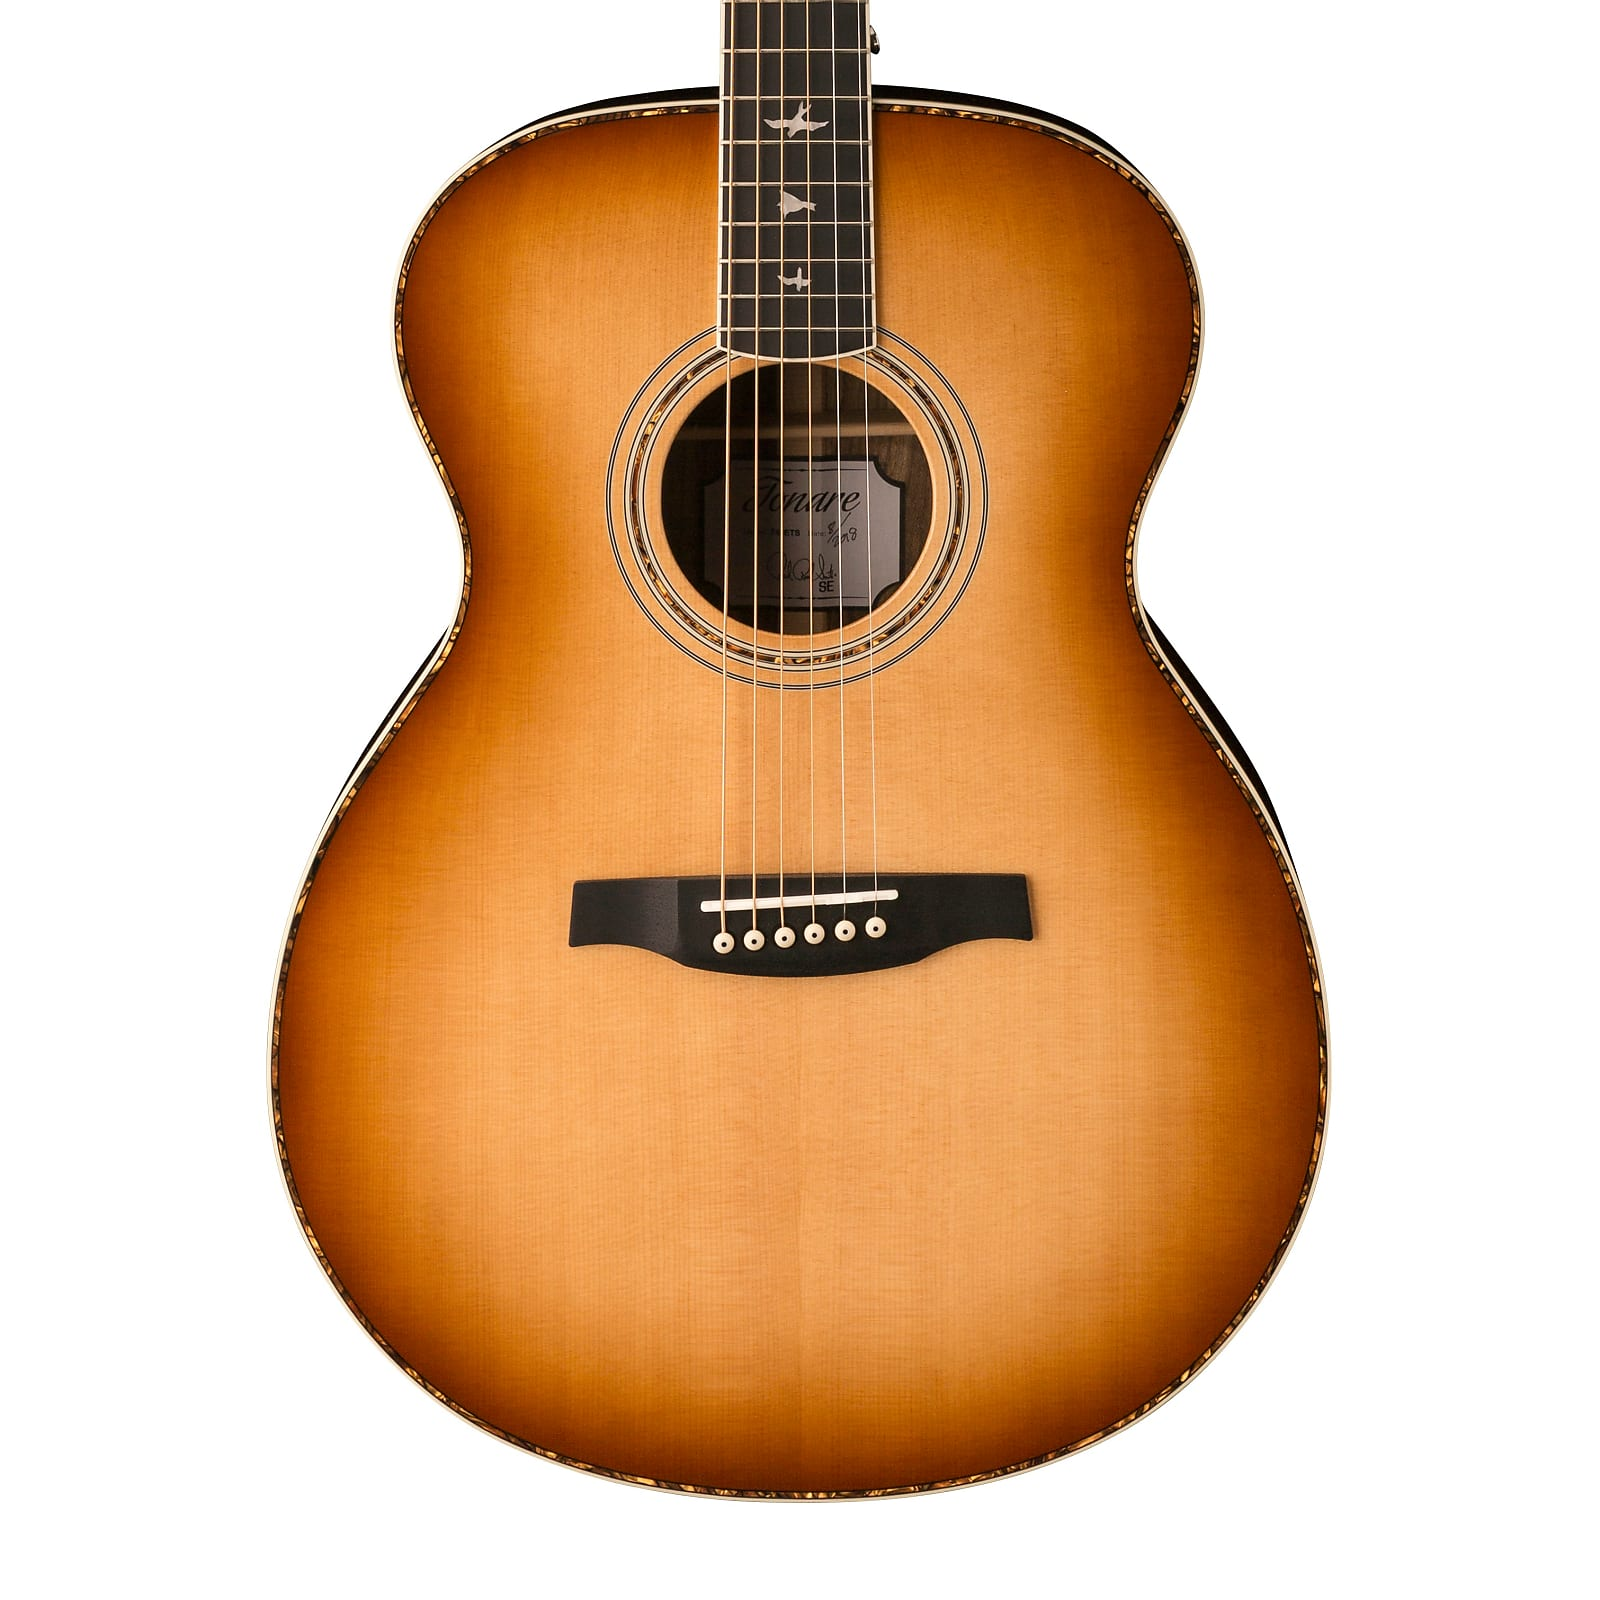 Paul Reed Smith PRS SE T40E Tonare Acoustic Electric Guitar Tobacco Sunburst w/